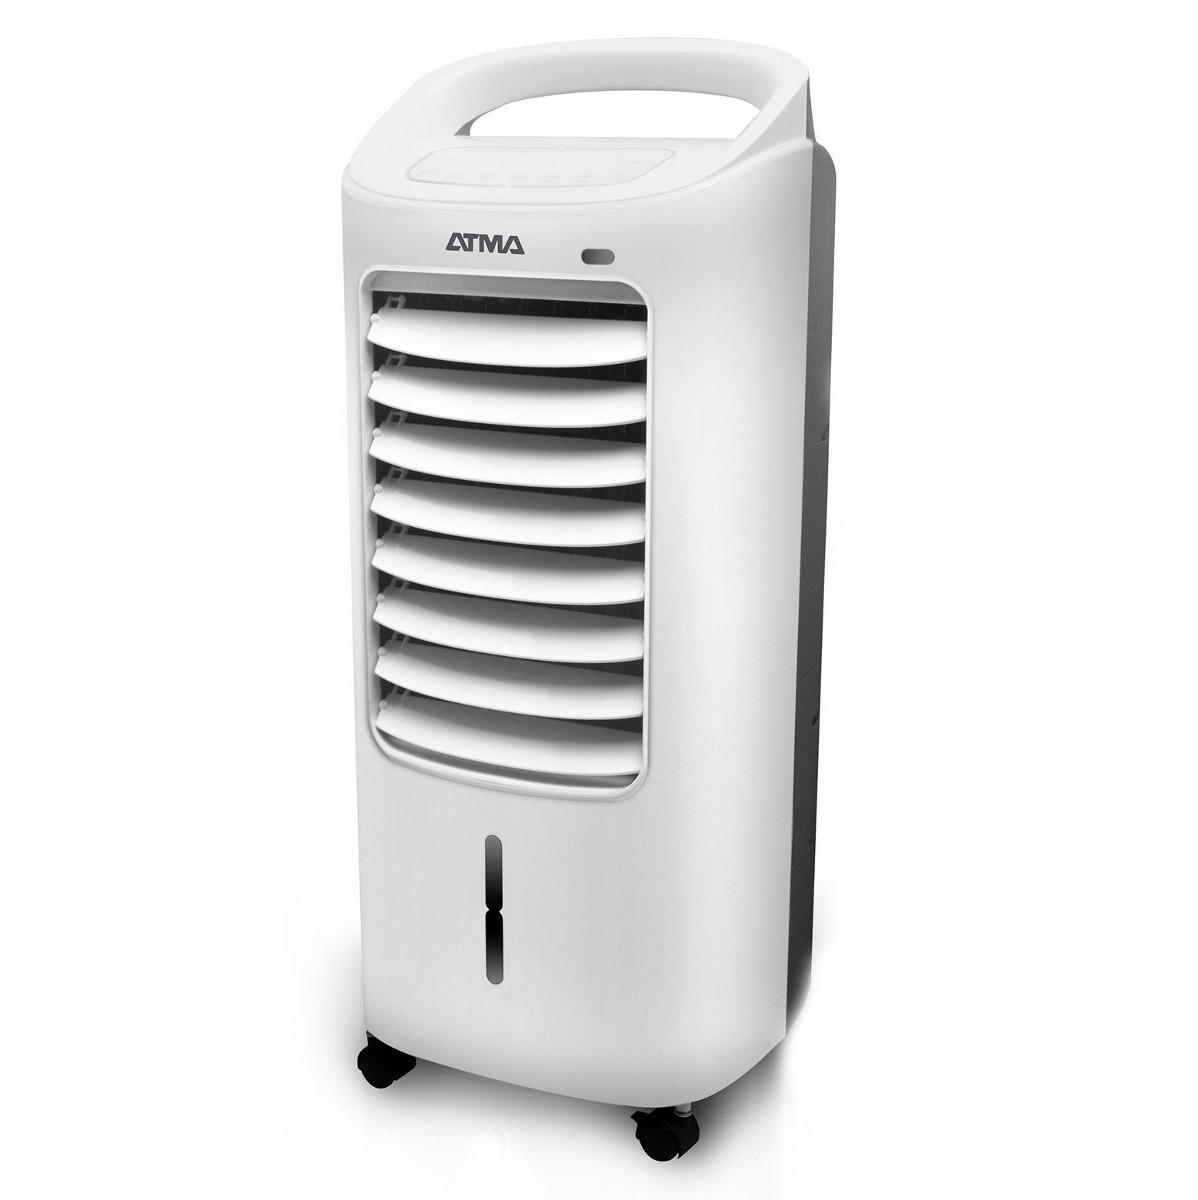 Climatizador Atma Cp 8143 Fc